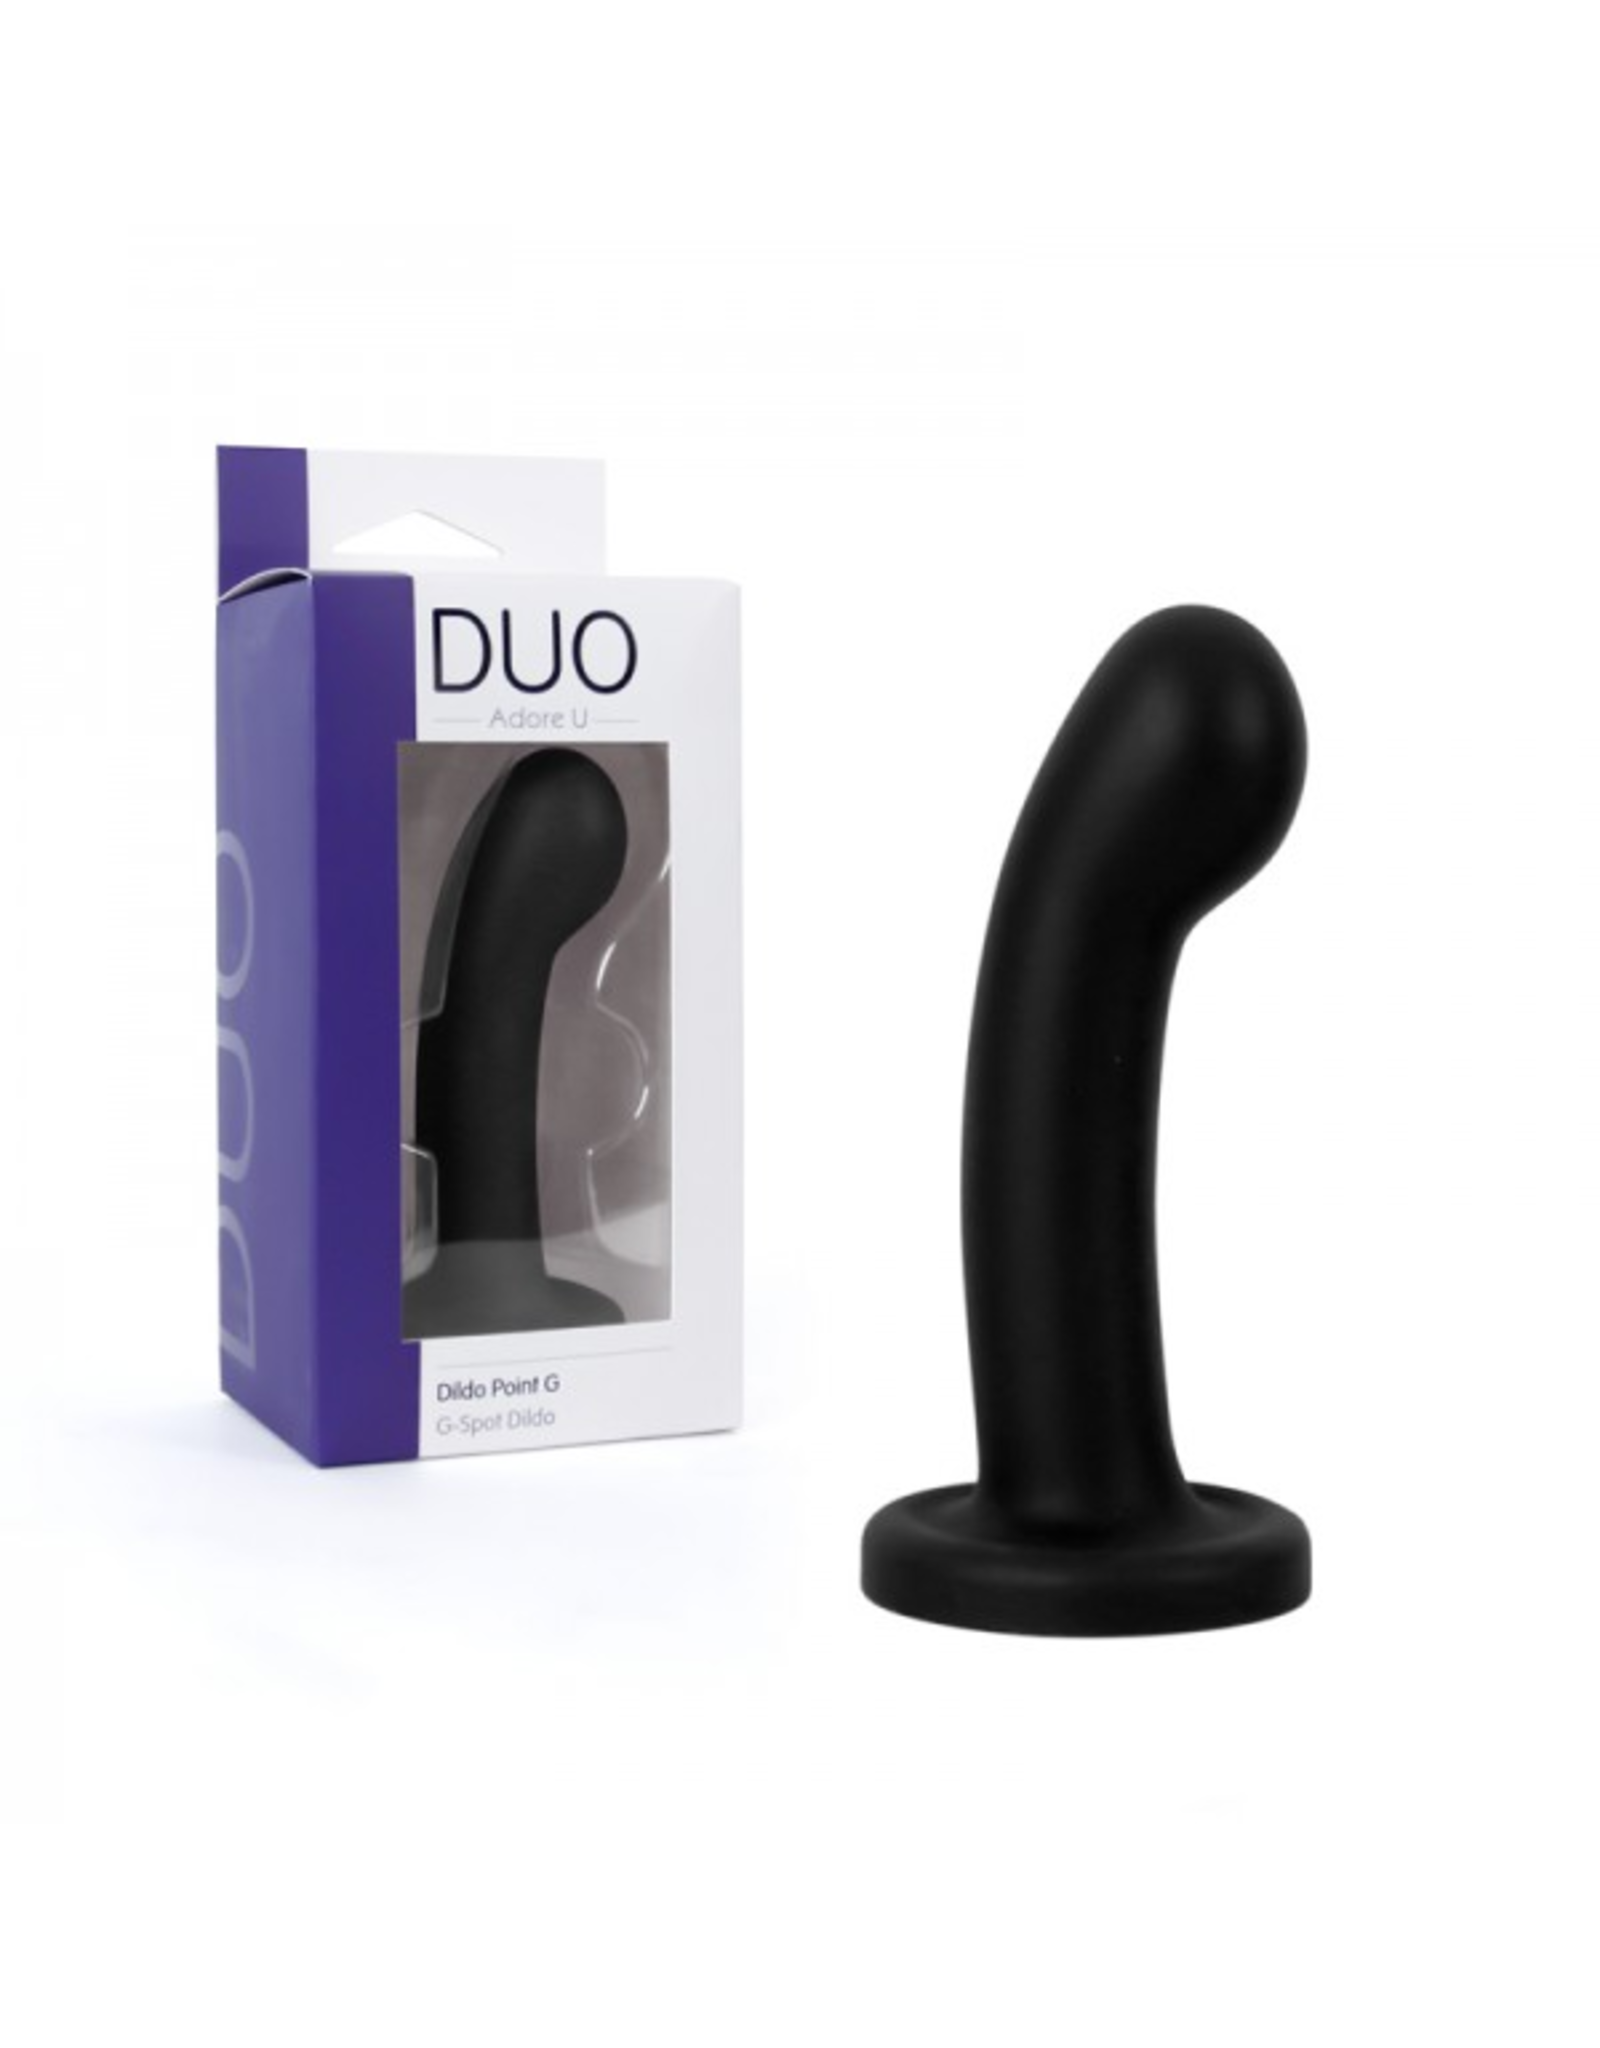 ADORE U - DUO - CURVED & ROUNDED DILDO - BLACK